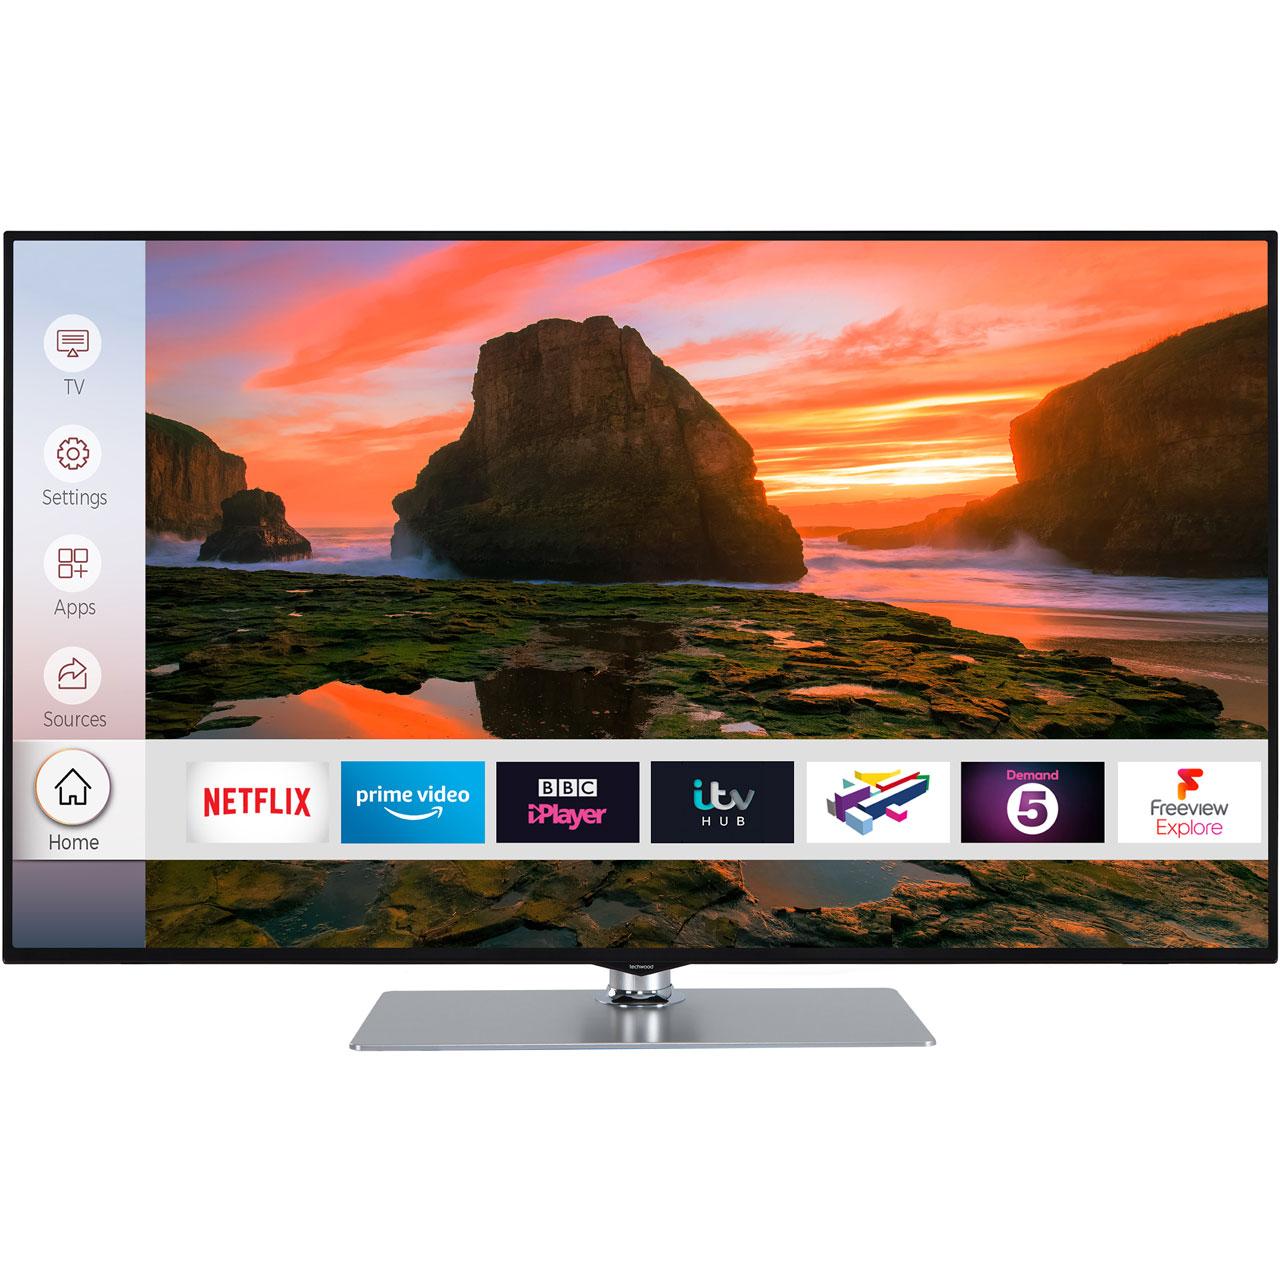 Techwood TV + Xbox Bundles from just £299 @ AO e.g 43'' Smart 4K TV + Xbox One S 1TB w/ Forza Horizon 4 £299